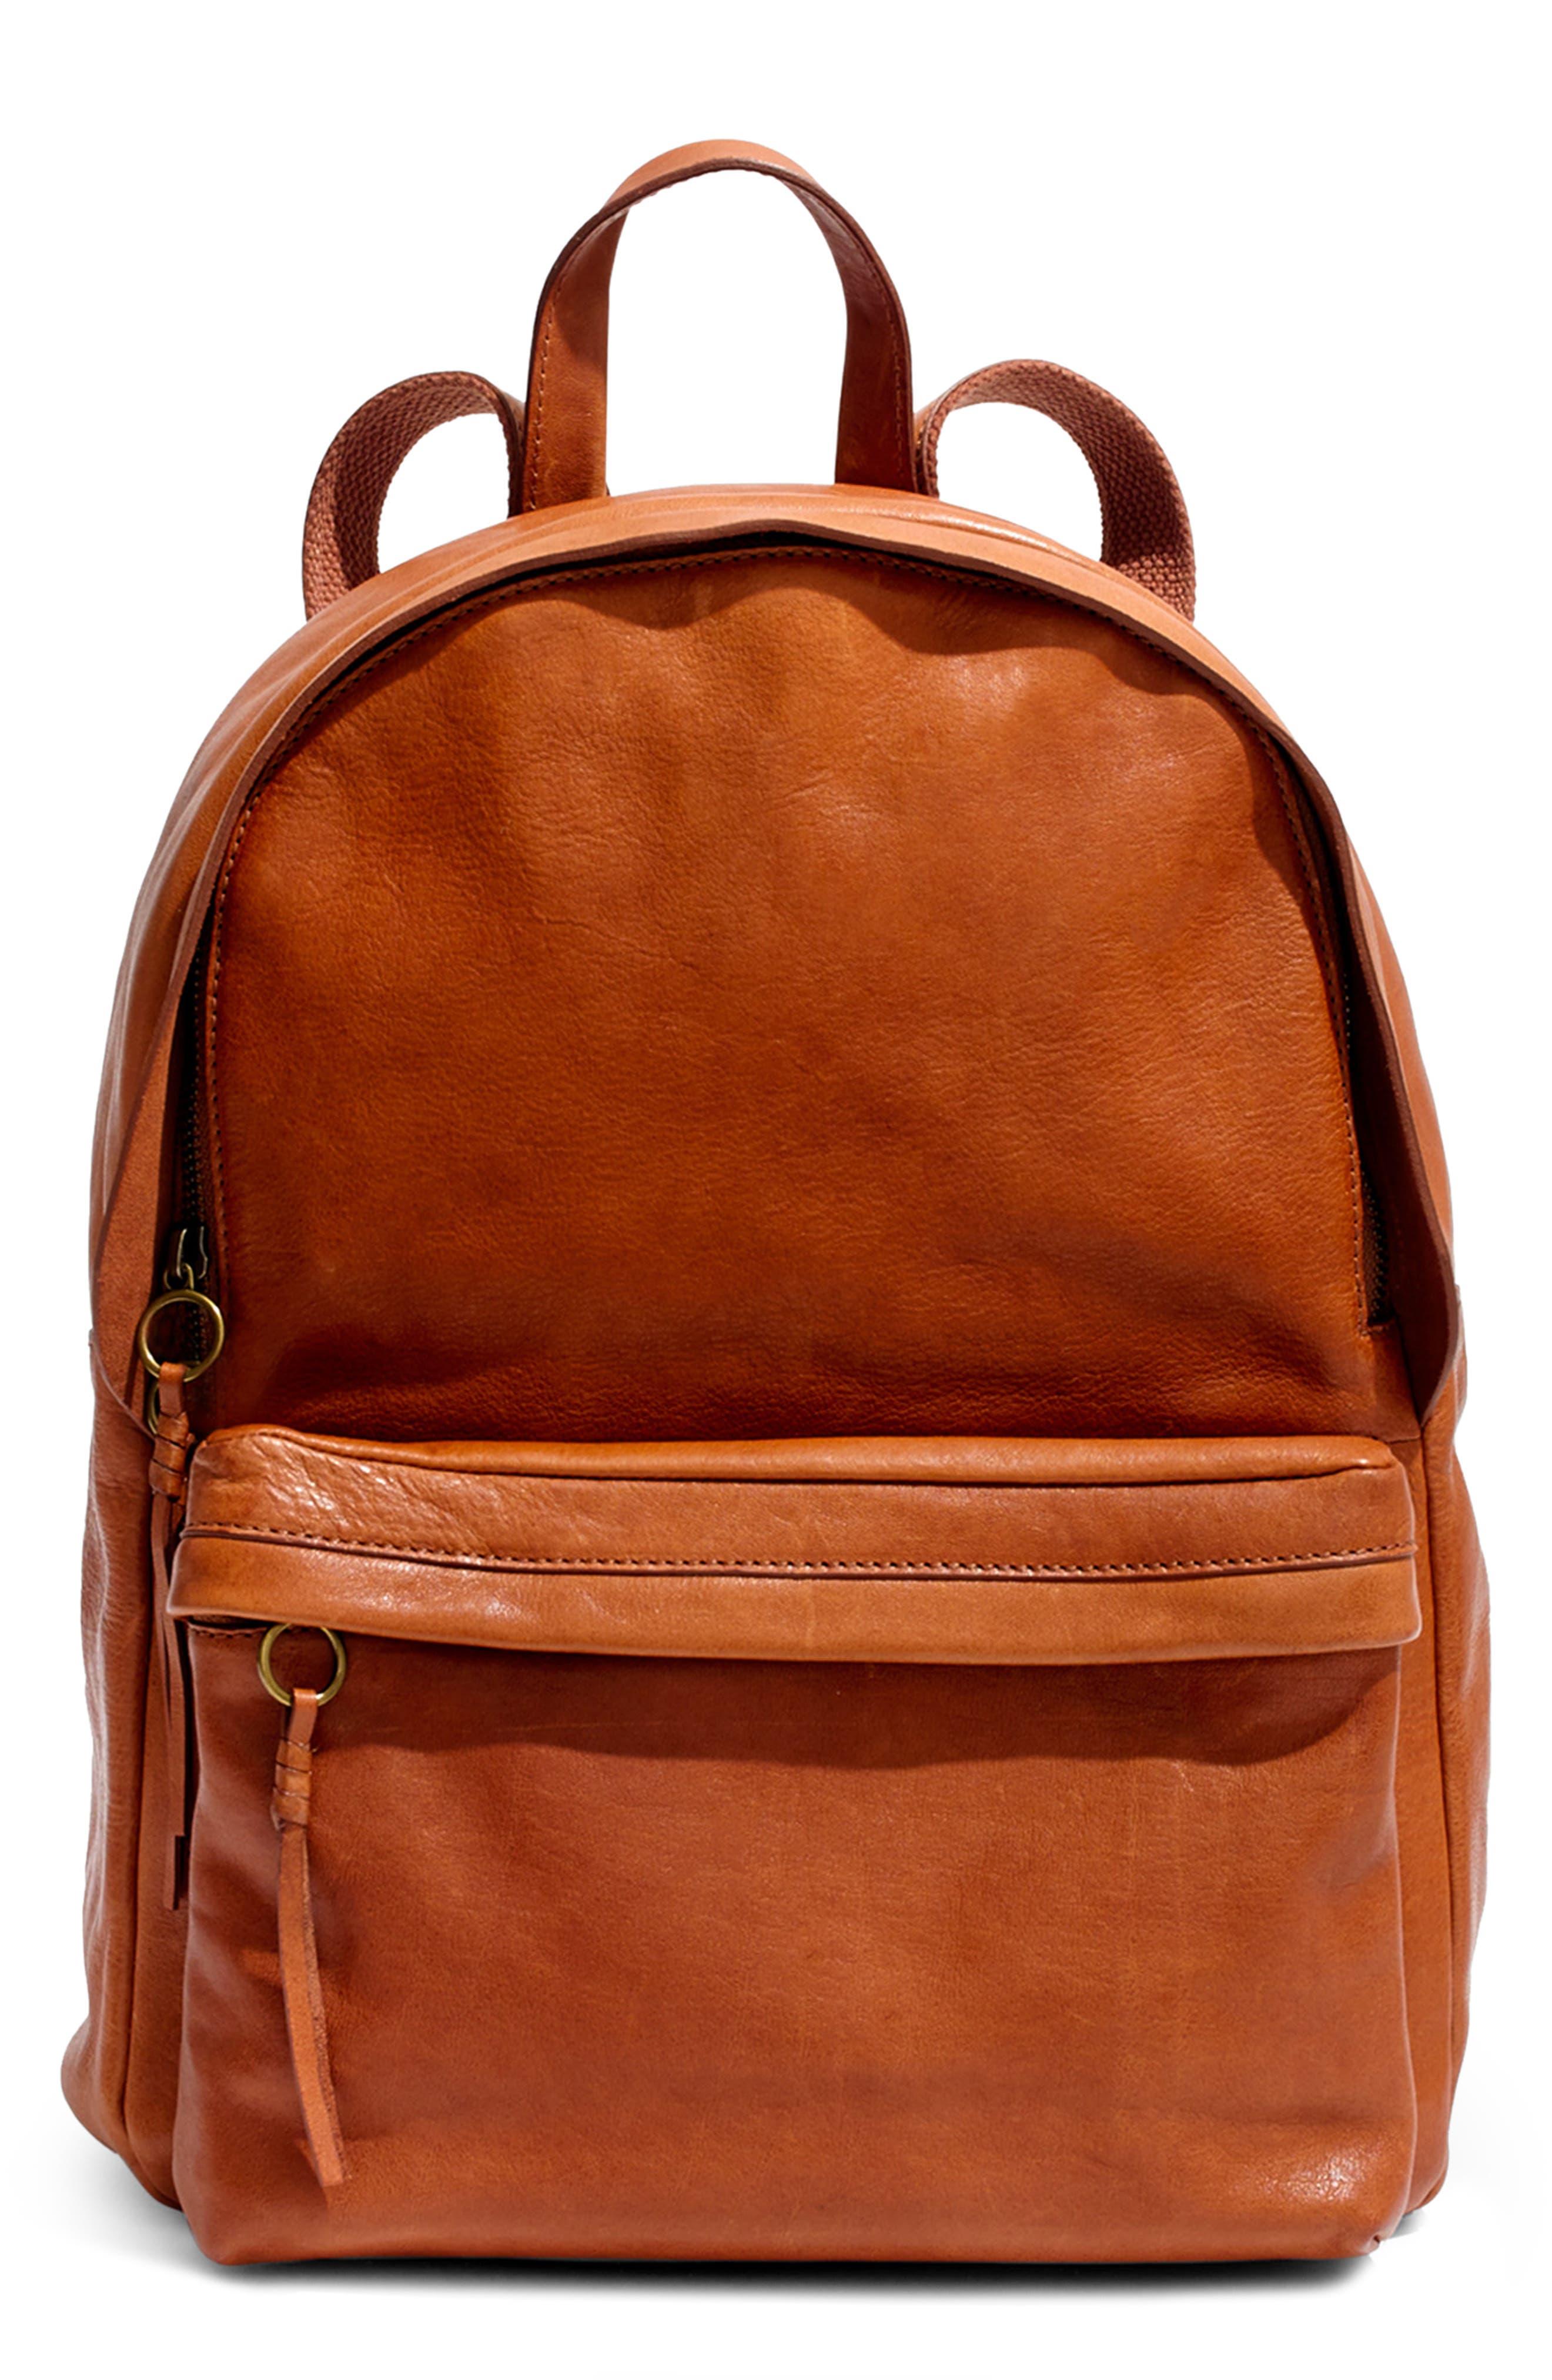 Lorimer Leather Backpack